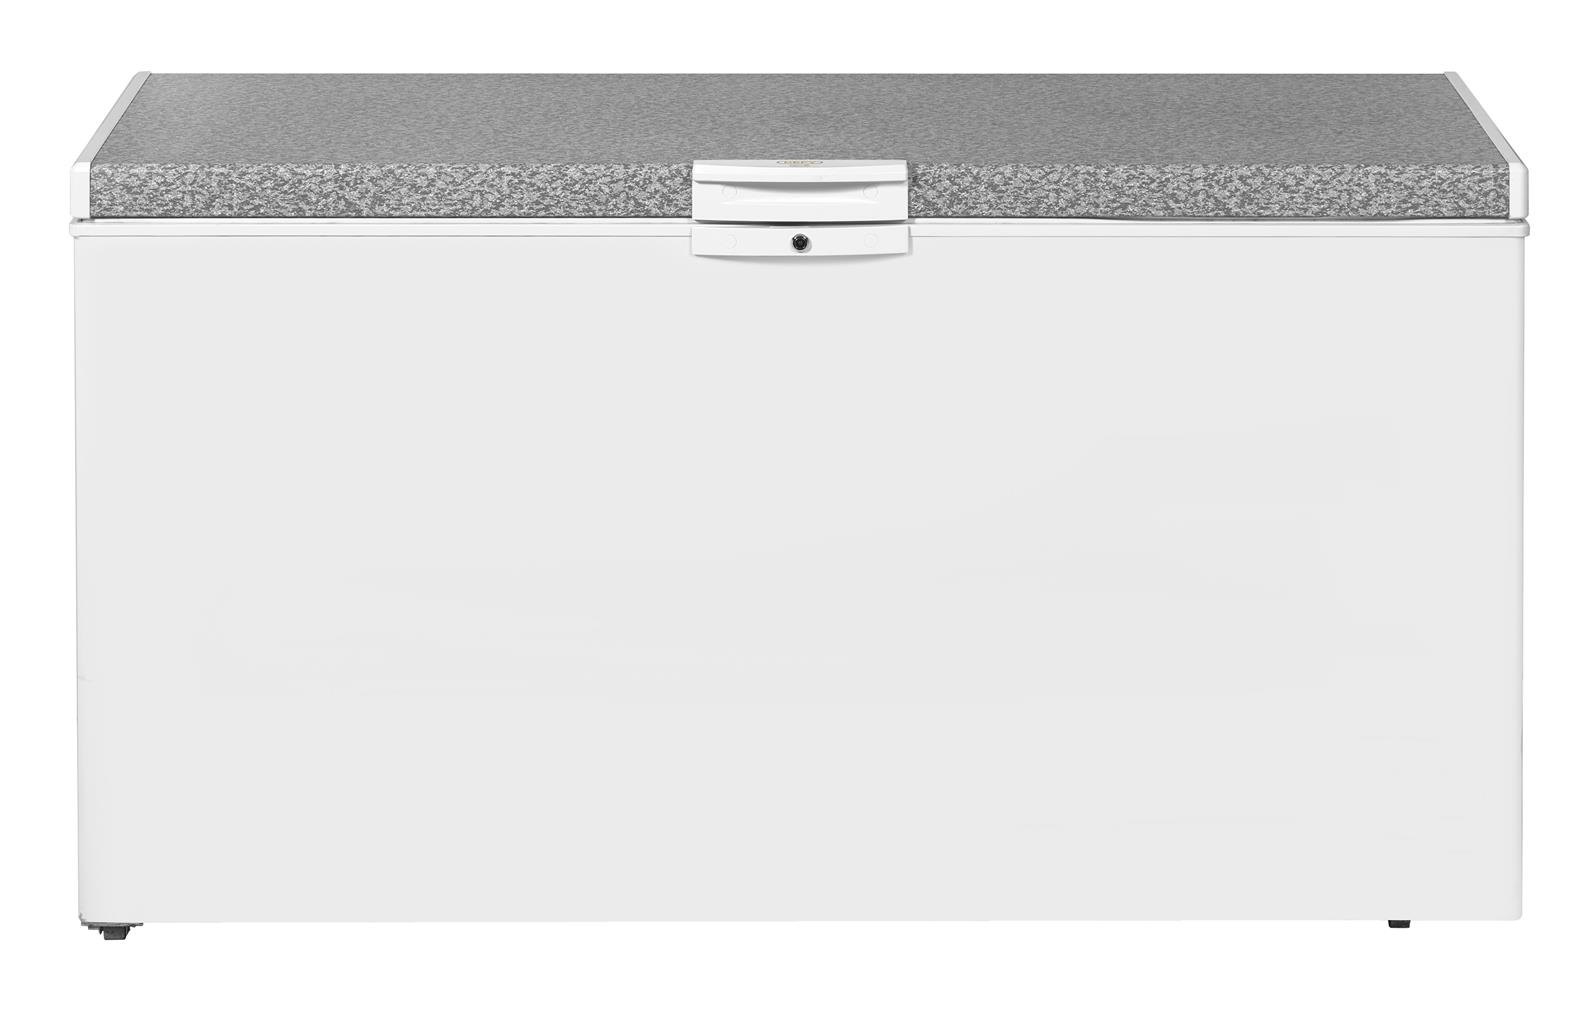 Defy 530ltr Chest Freezer White - New! Hardly used